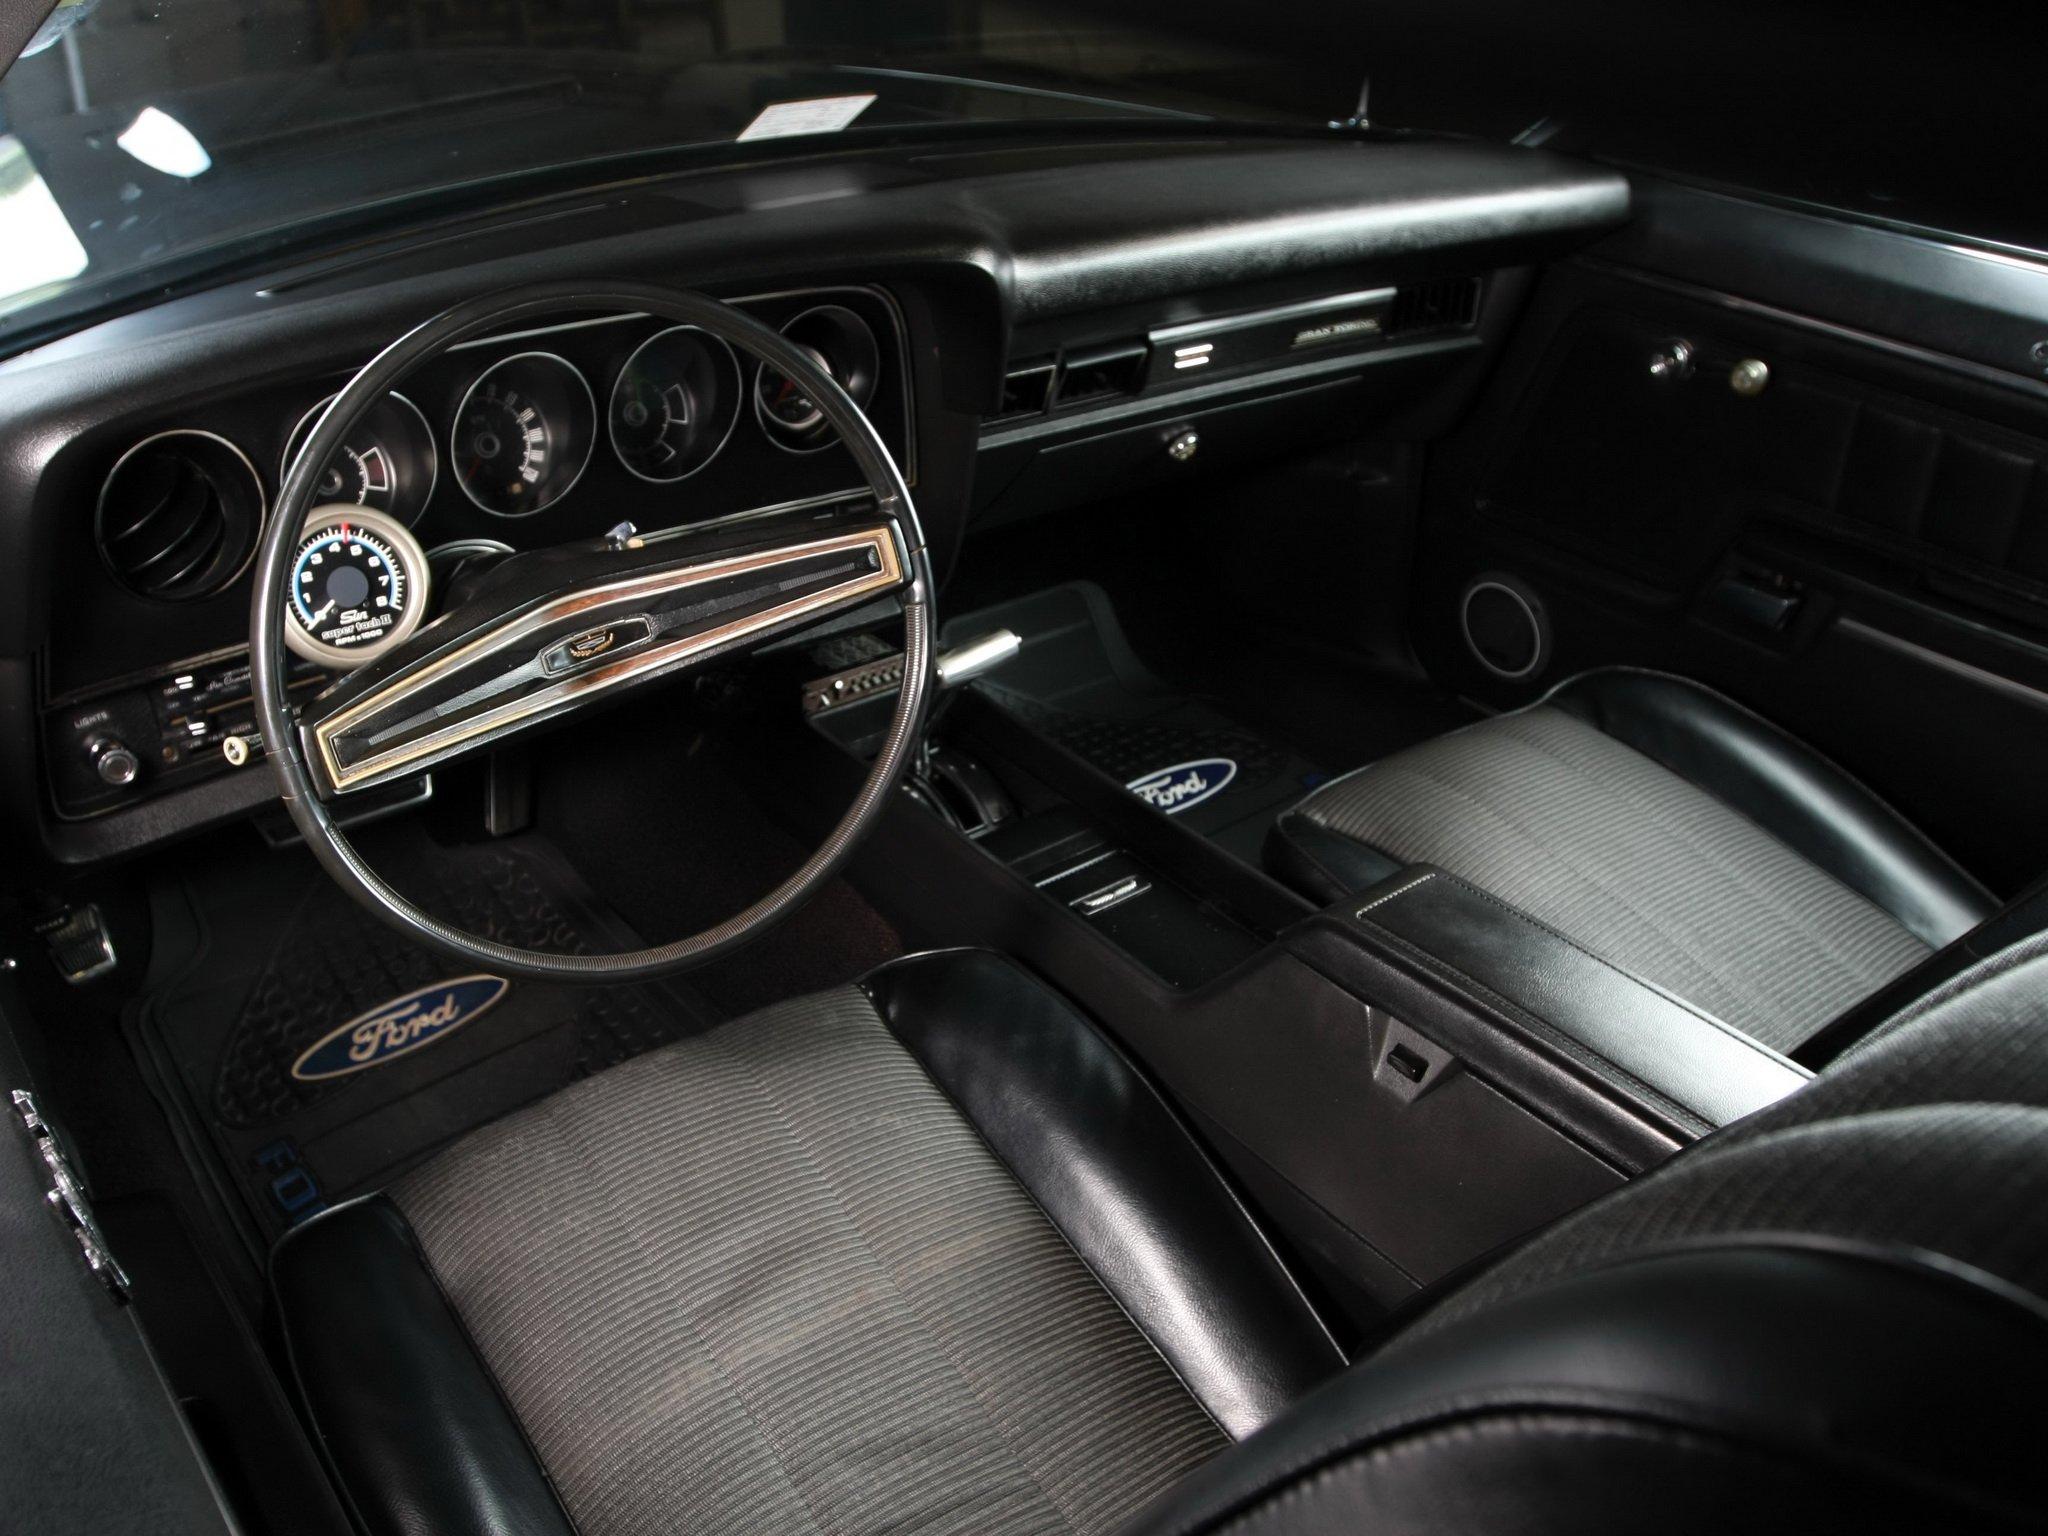 1972 ford gran torino 2 door fastback cars wallpaper 2048x1536 743026 wallpaperup - Ford Torino 2015 Interior